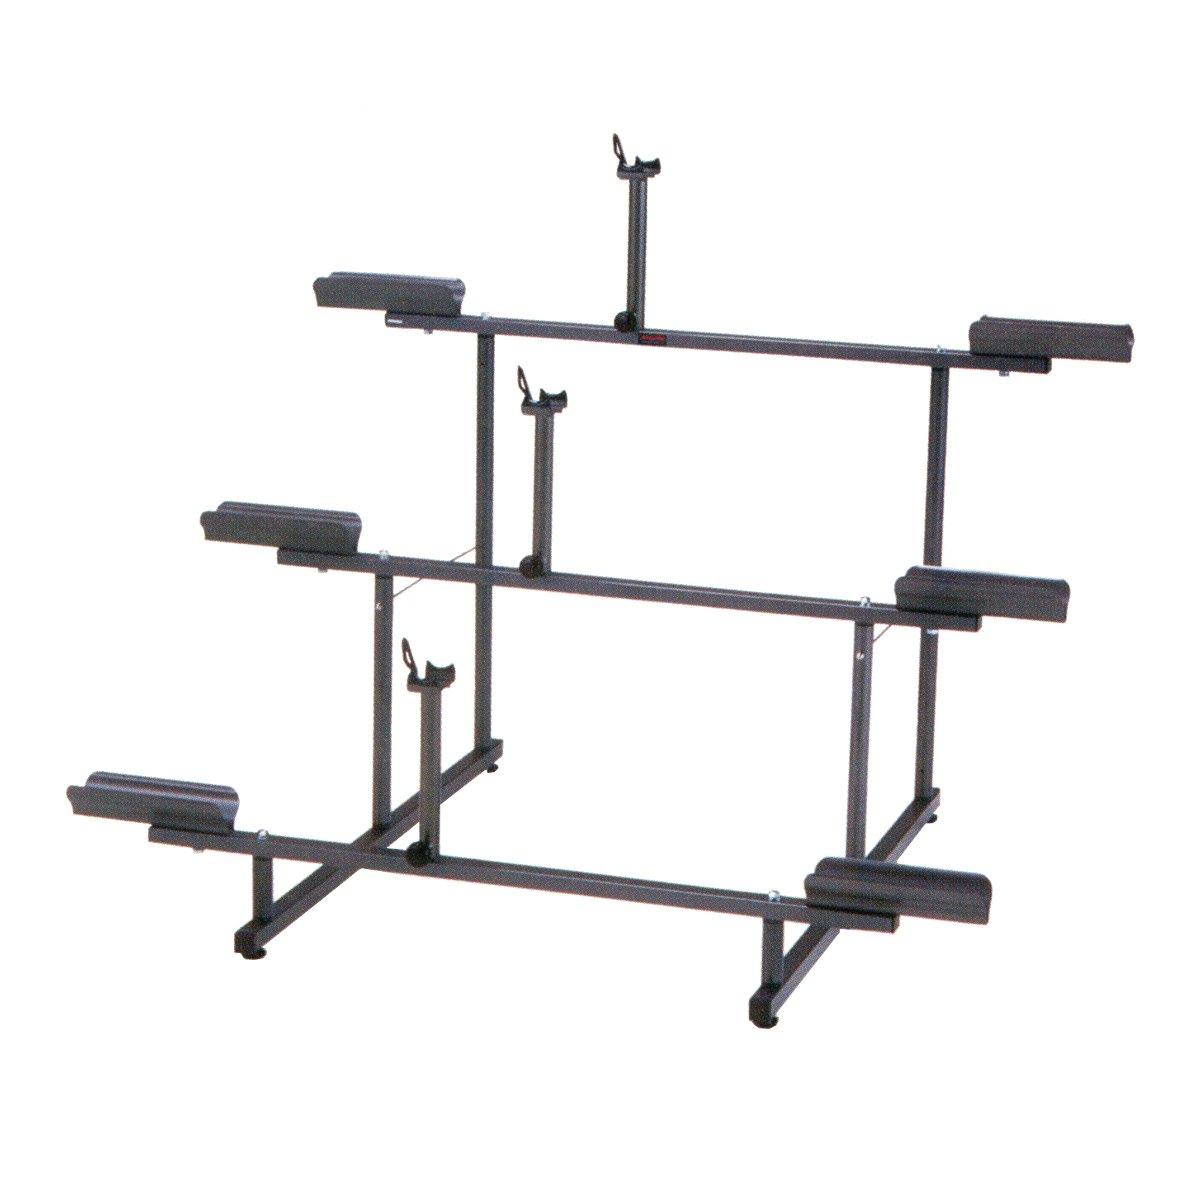 Minoura 971-3 Tier 3-Bike Display Stand, Grey